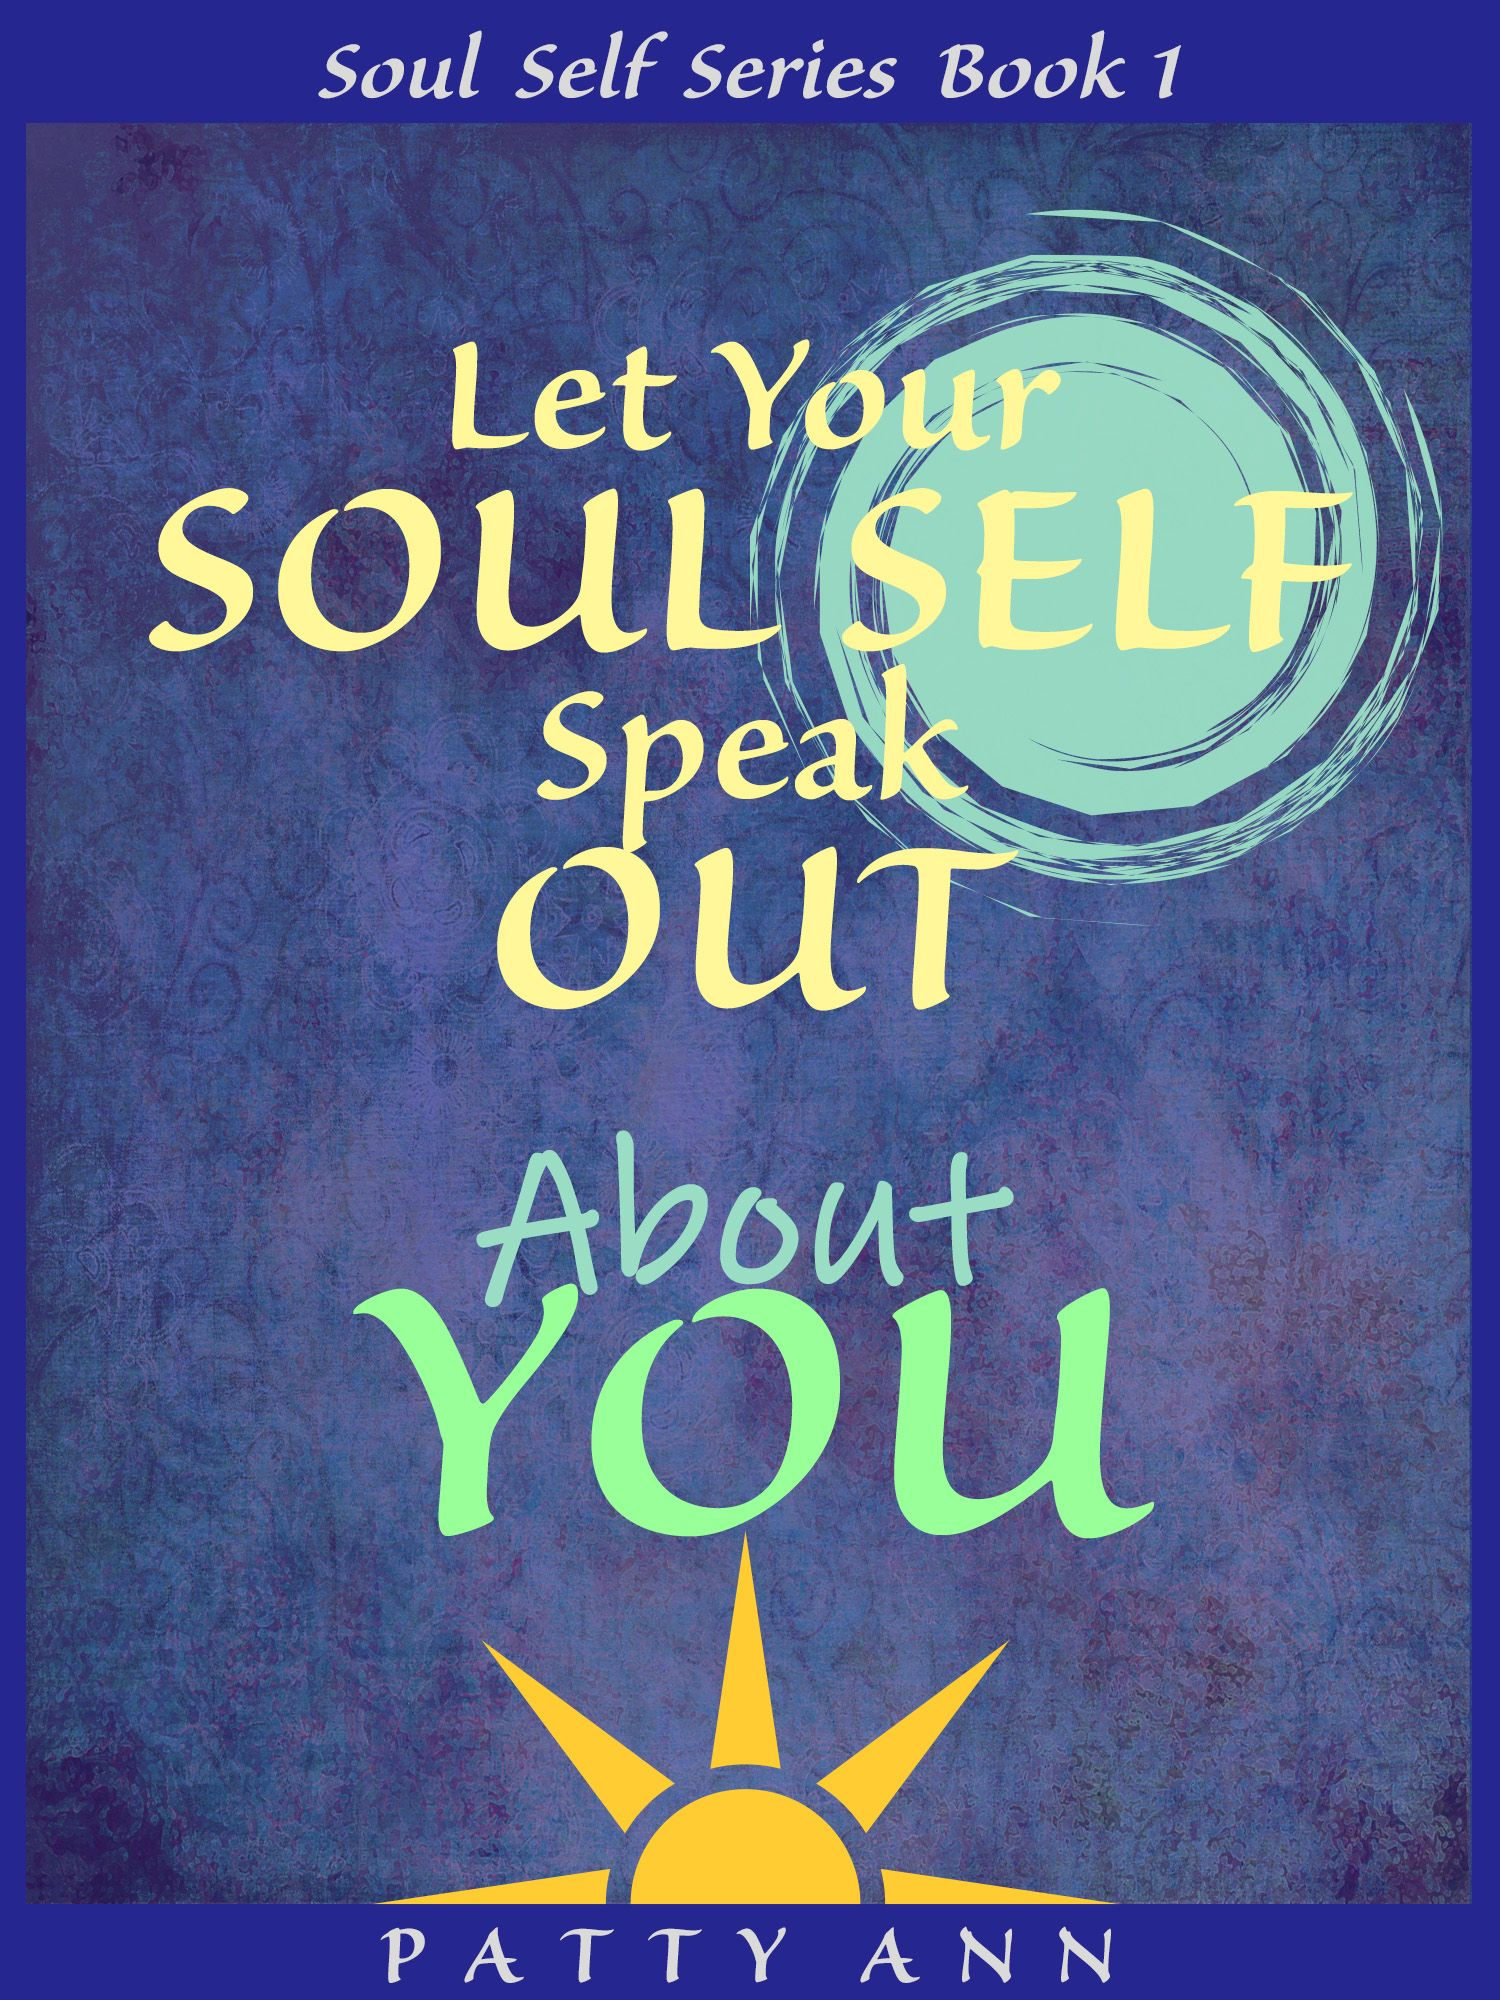 Soul Self You